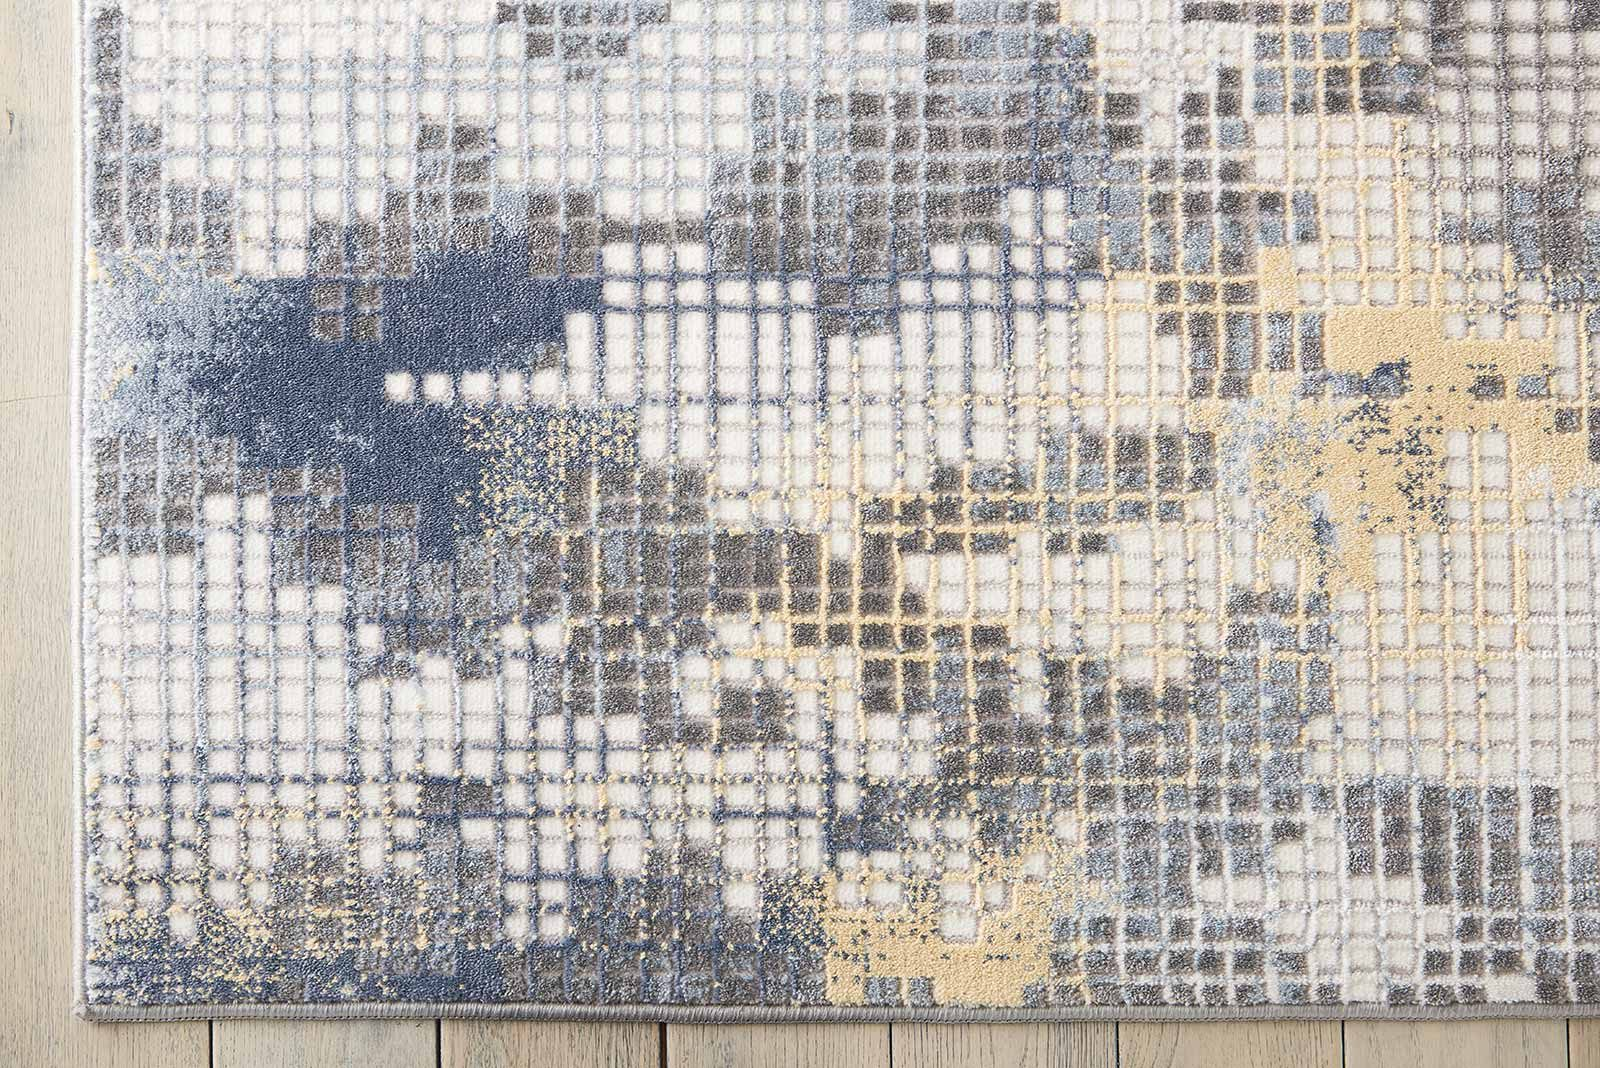 Nourison rug Urban Decor URD06 GRYIV 5x7 099446467218 CR01